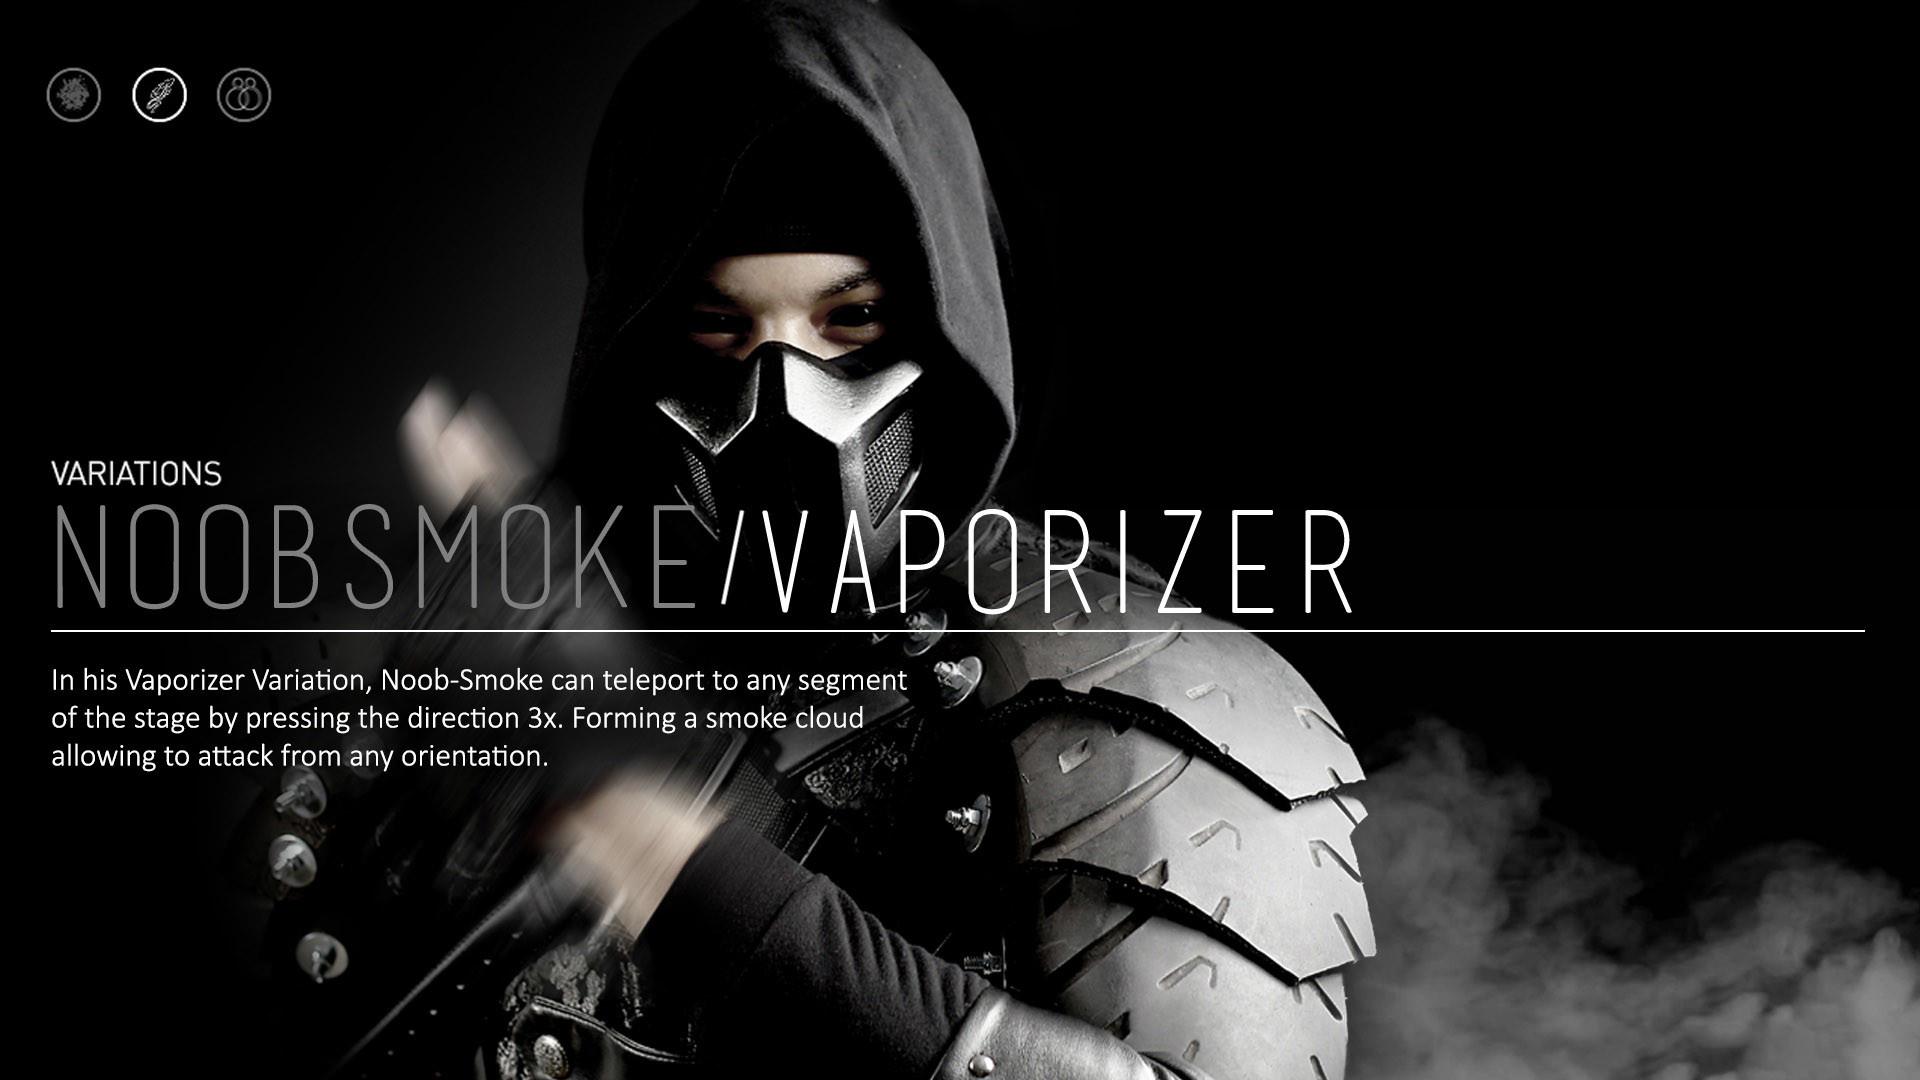 Mortal Kombat X Noob Smoke Wallpaper Wide or HD | Games Wallpapers